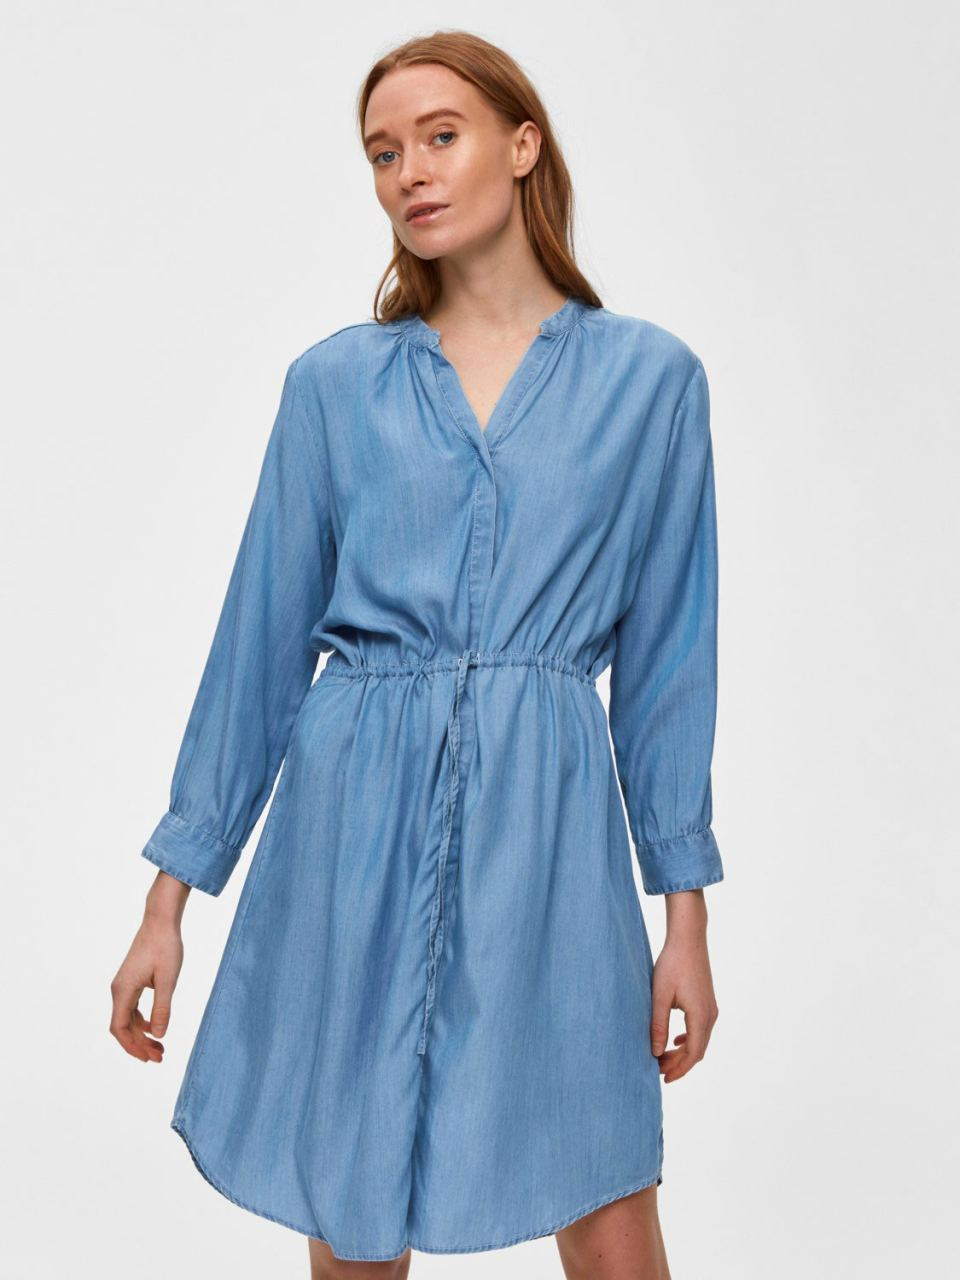 SLFMARLA 7/8 Dress Light Blue